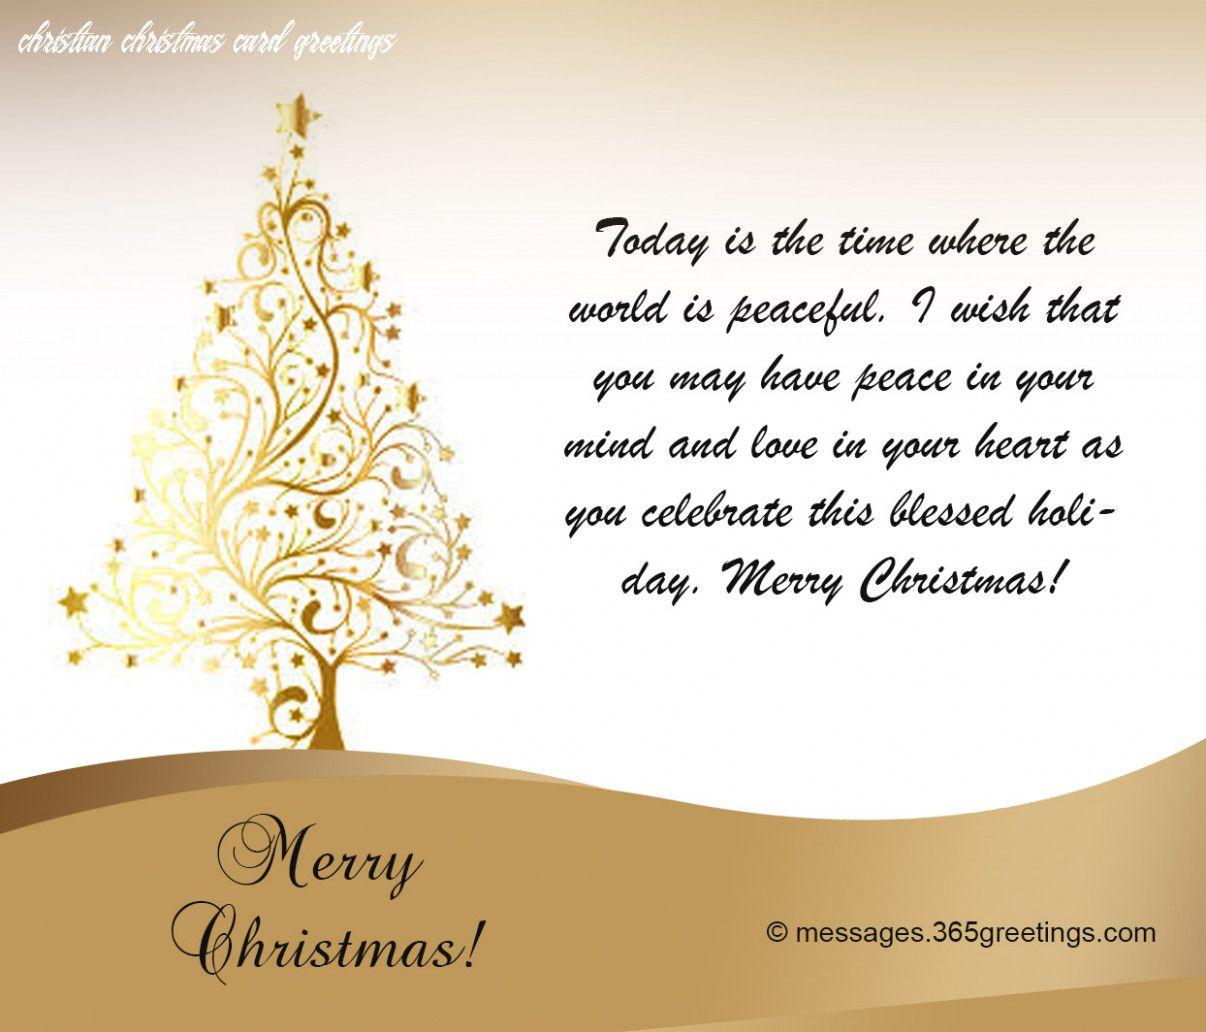 10 Christian Christmas Card Greetings in 2020 | Christmas card